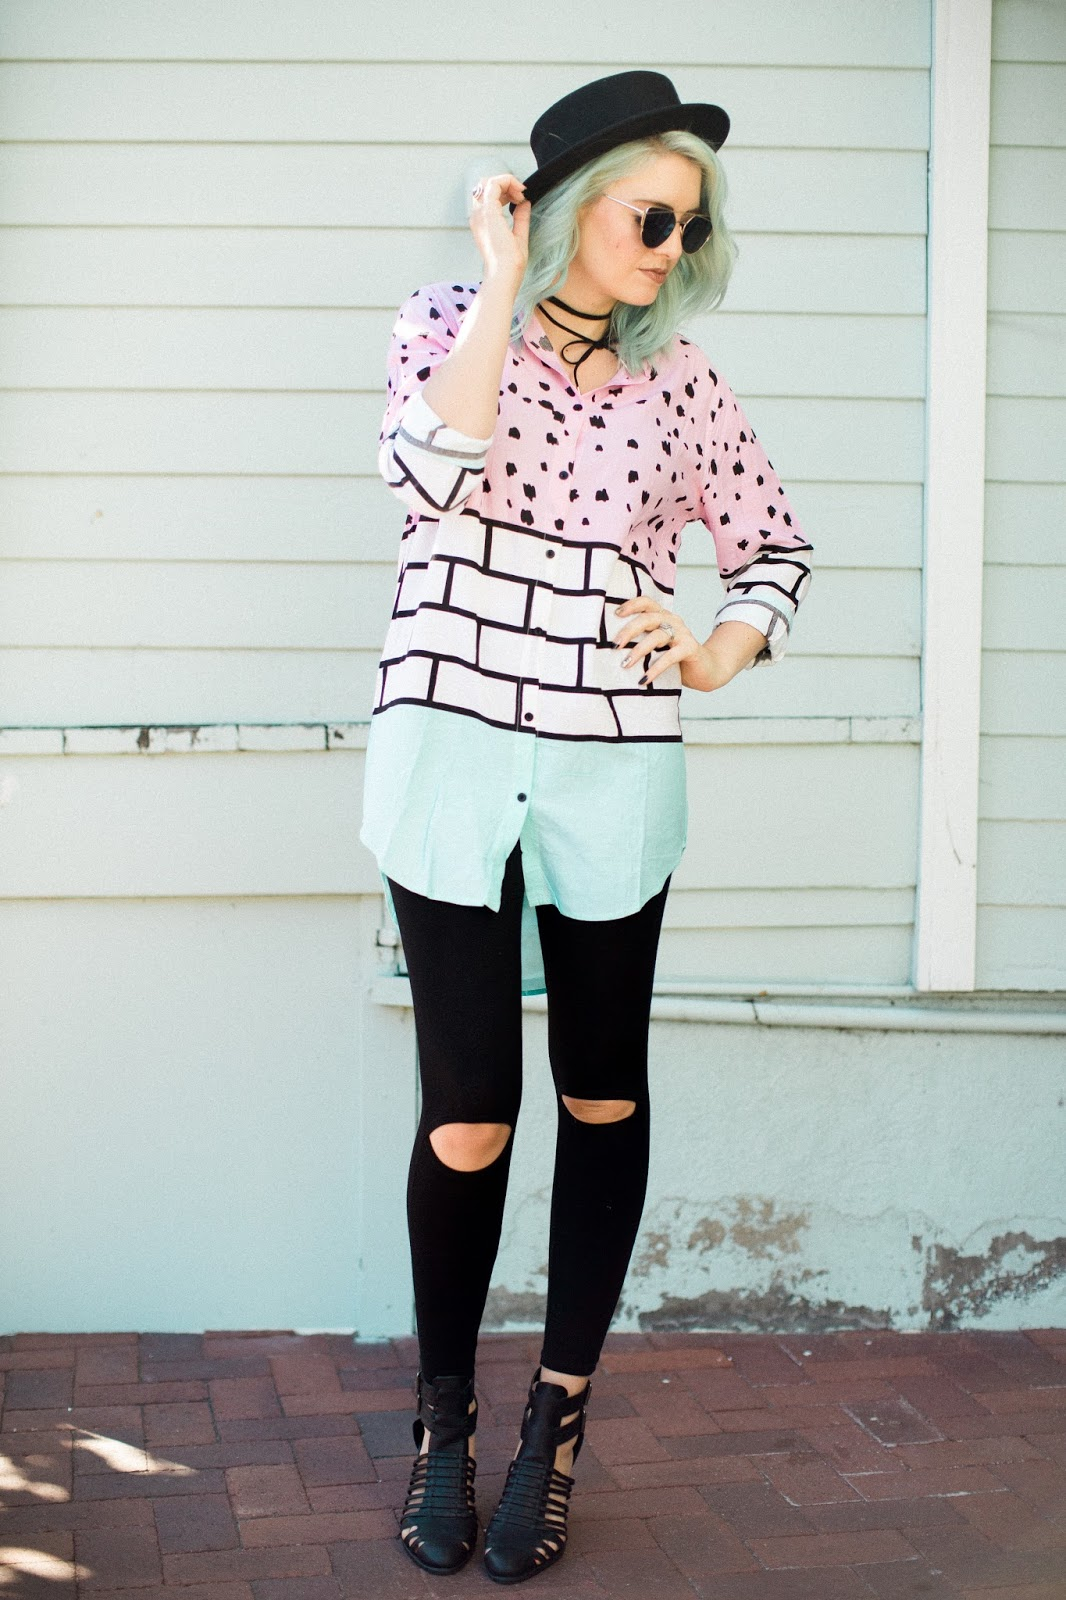 Peek-a-Boo Leggings, Utah Fashion Blogger, Modest Outfit